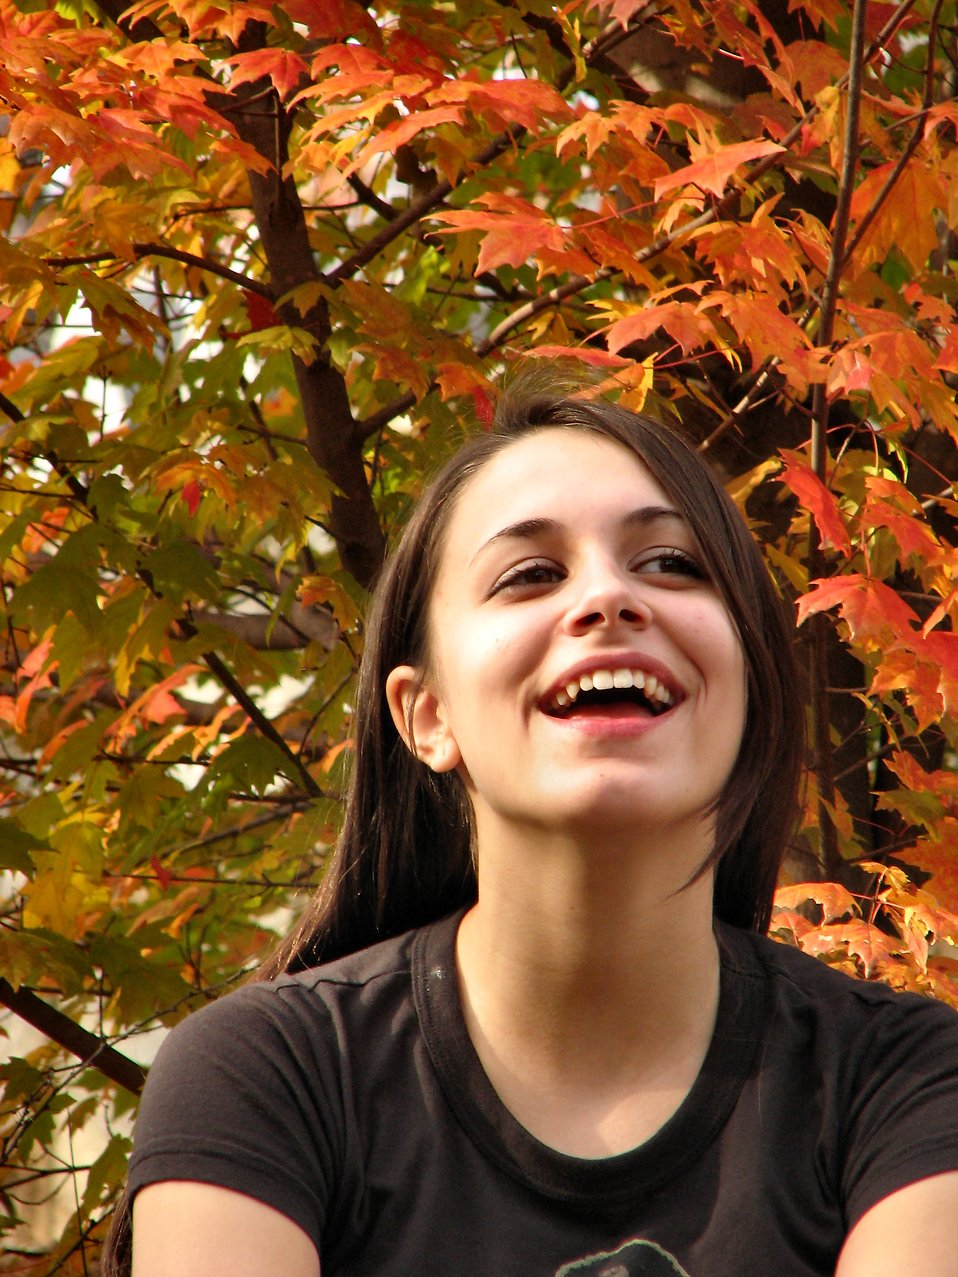 Closeup portrait of a teen girl outdoors : Free Stock Photo